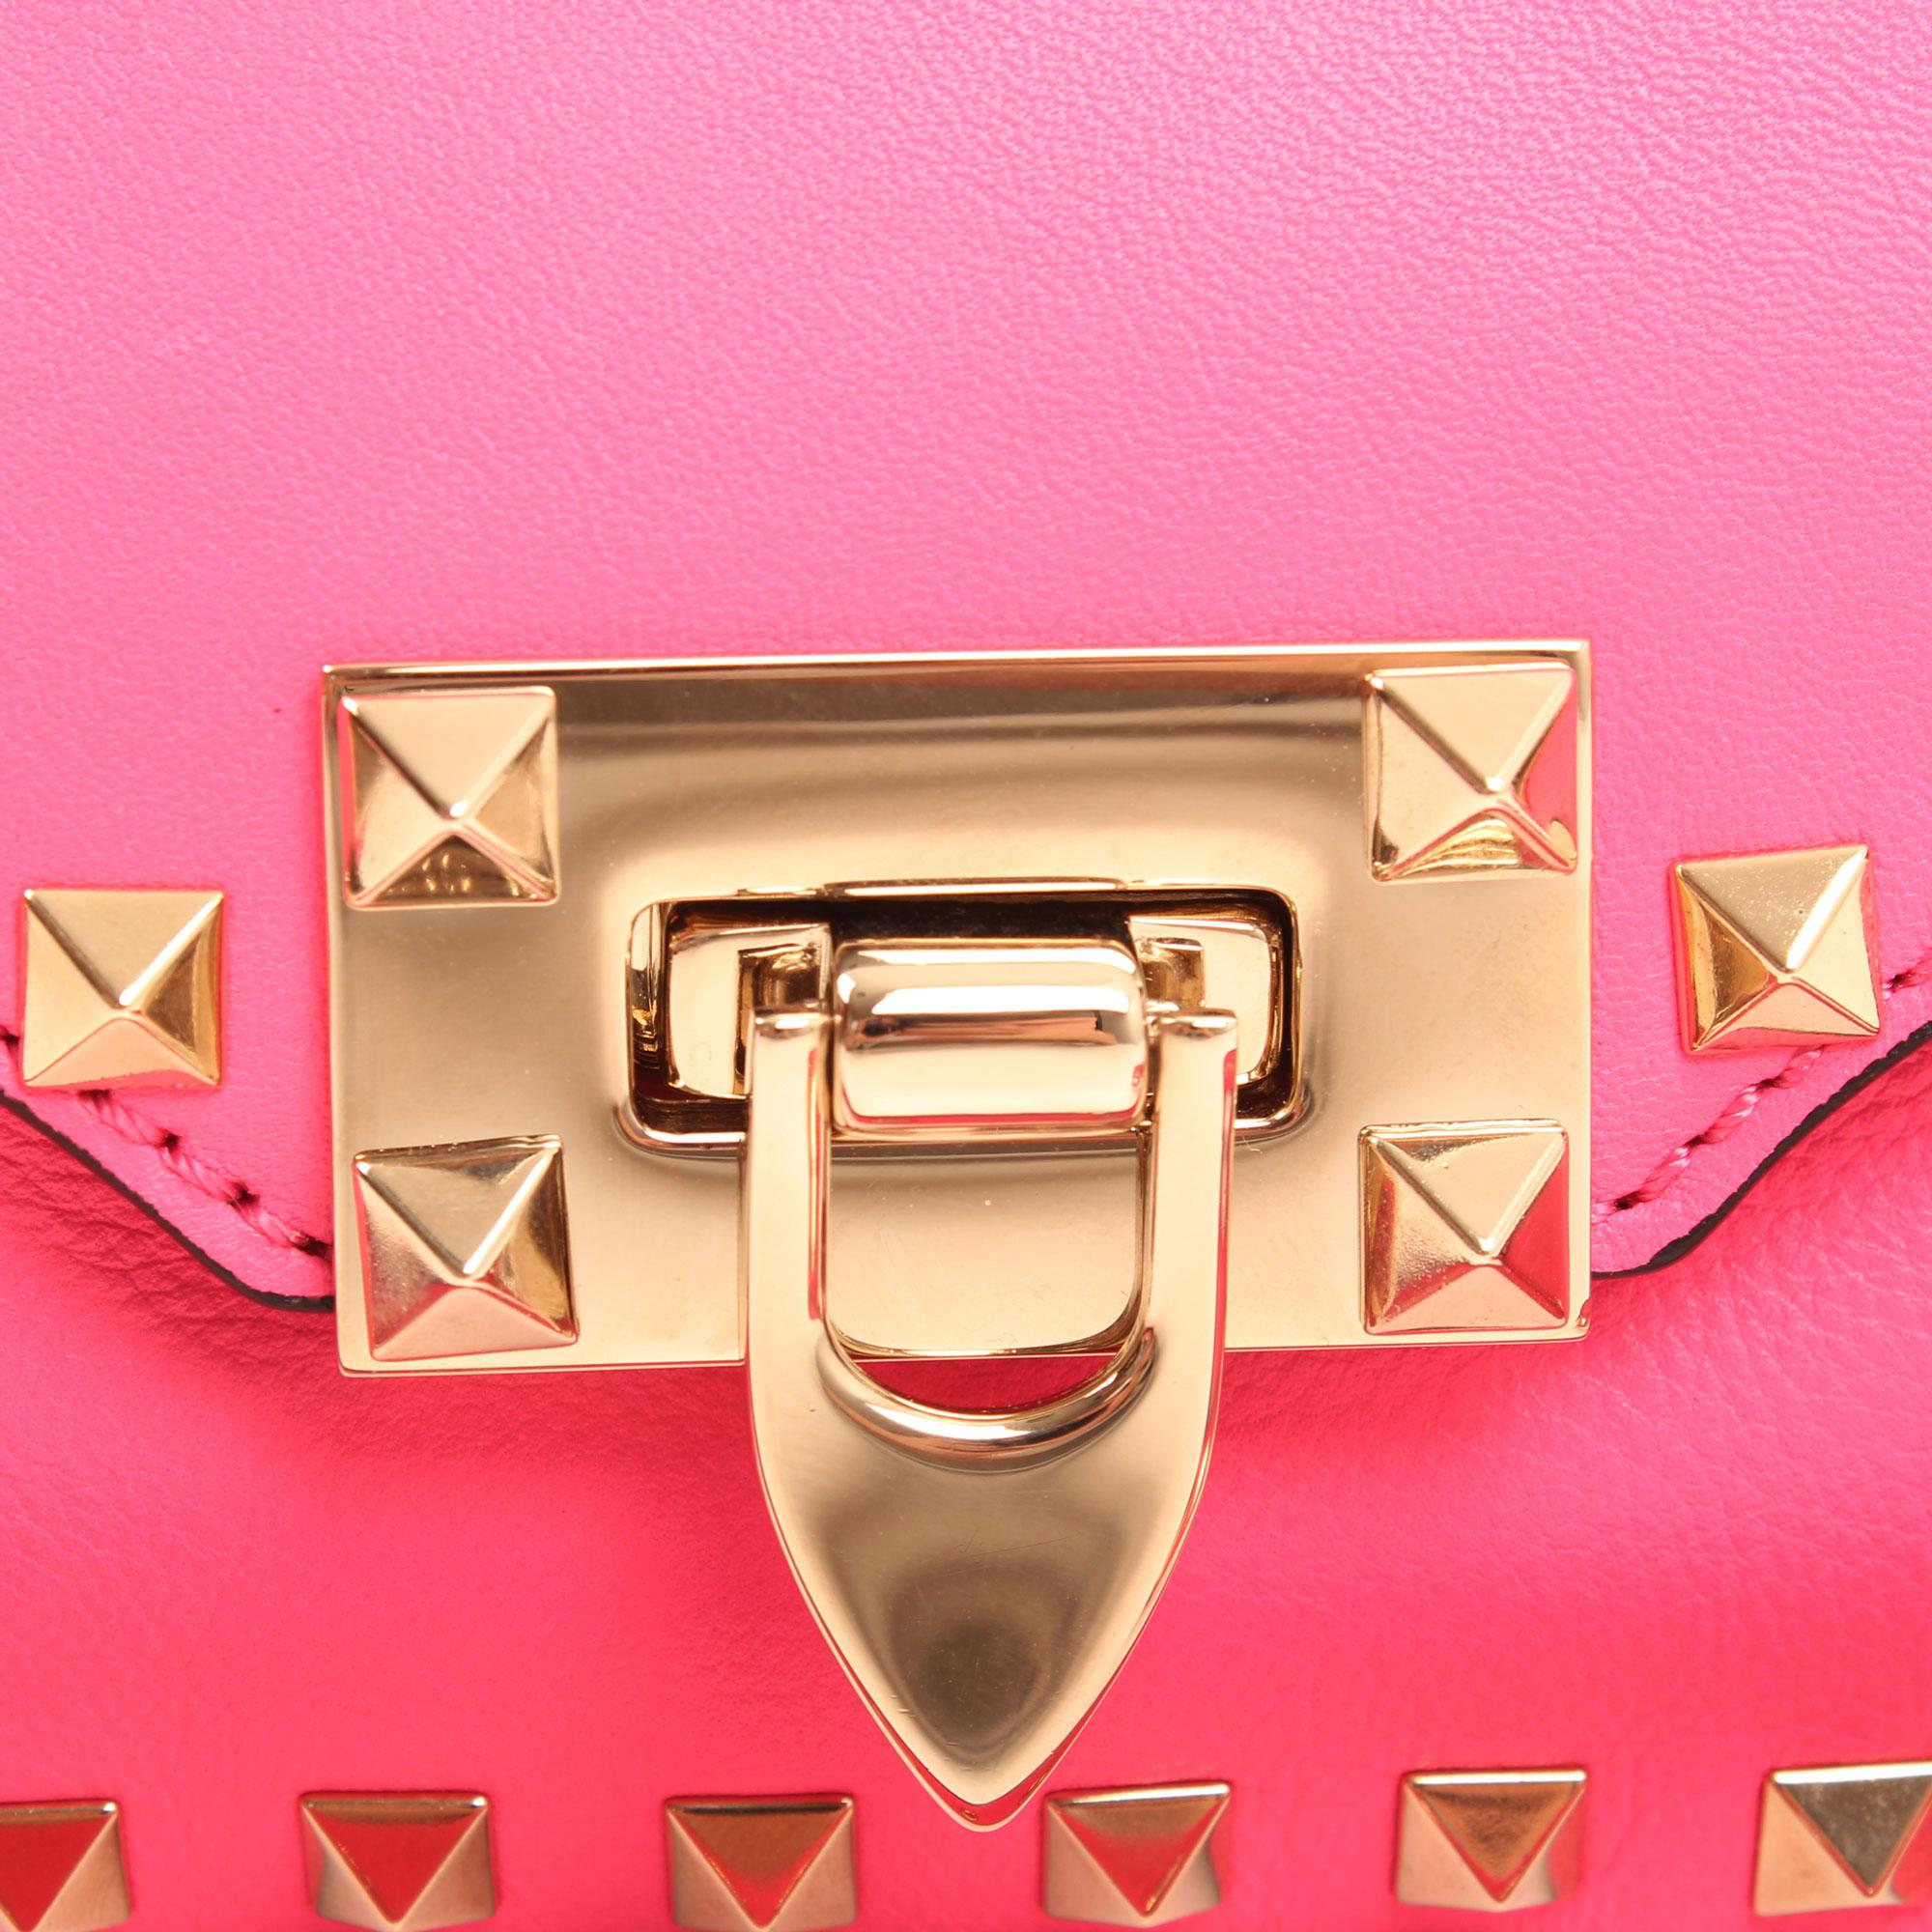 Detail clasp of valentino mini rockstud pink bag side